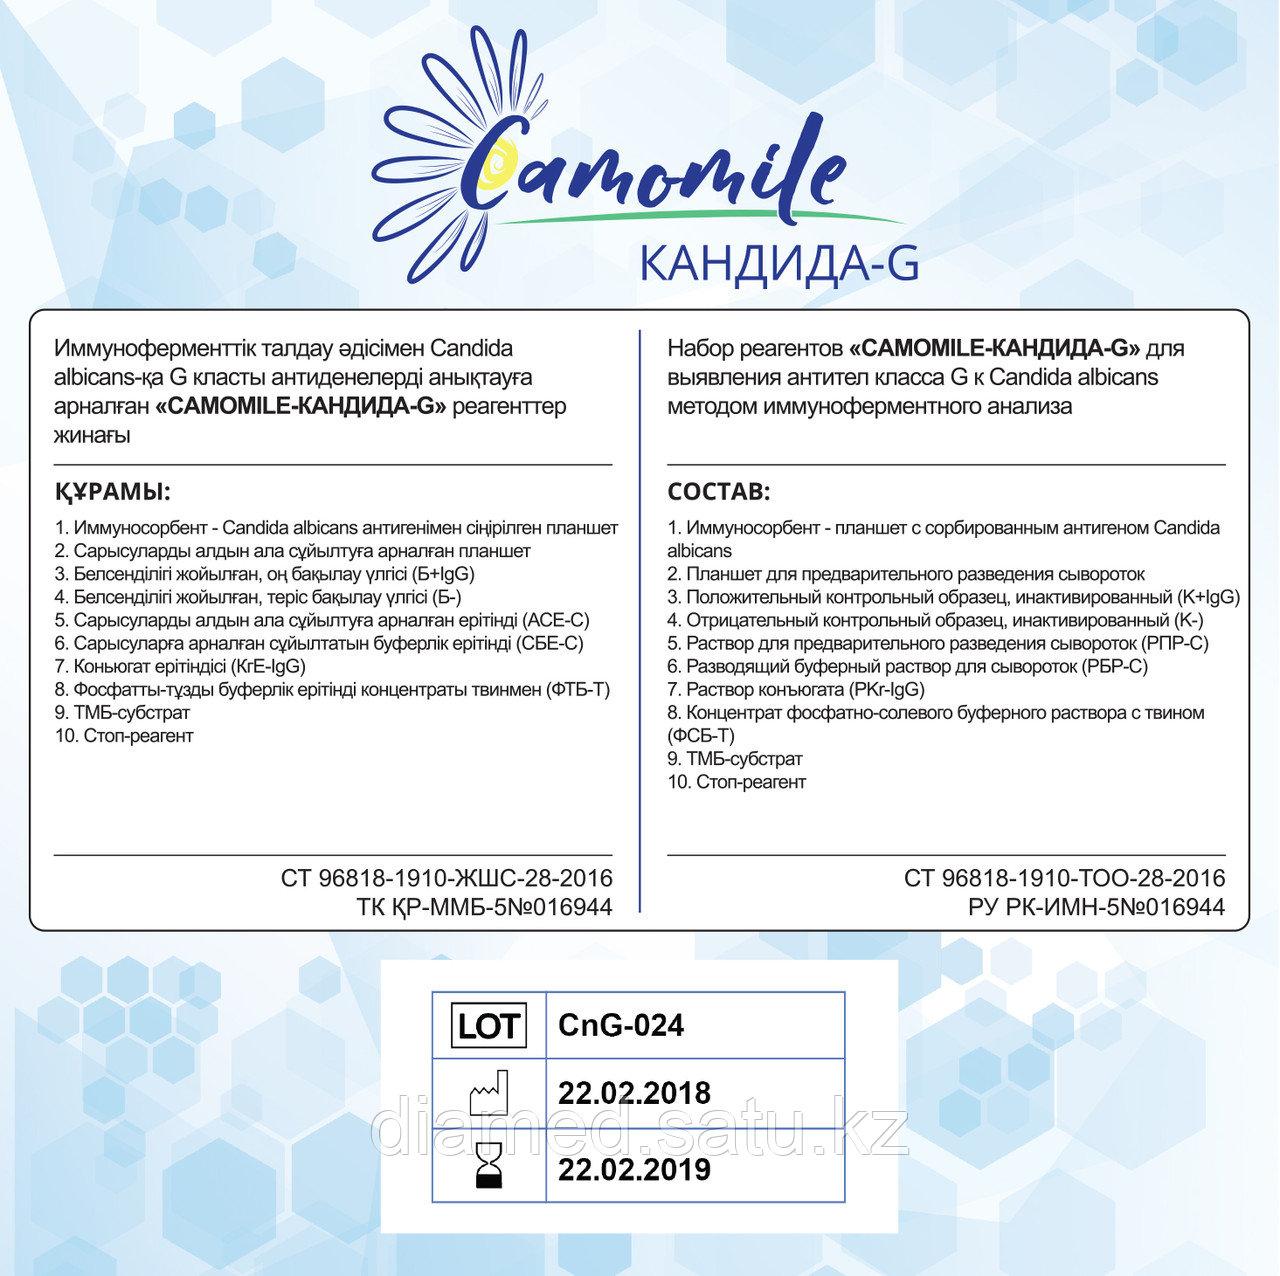 ИФА реагенты CAMOMILE-Кандида-G